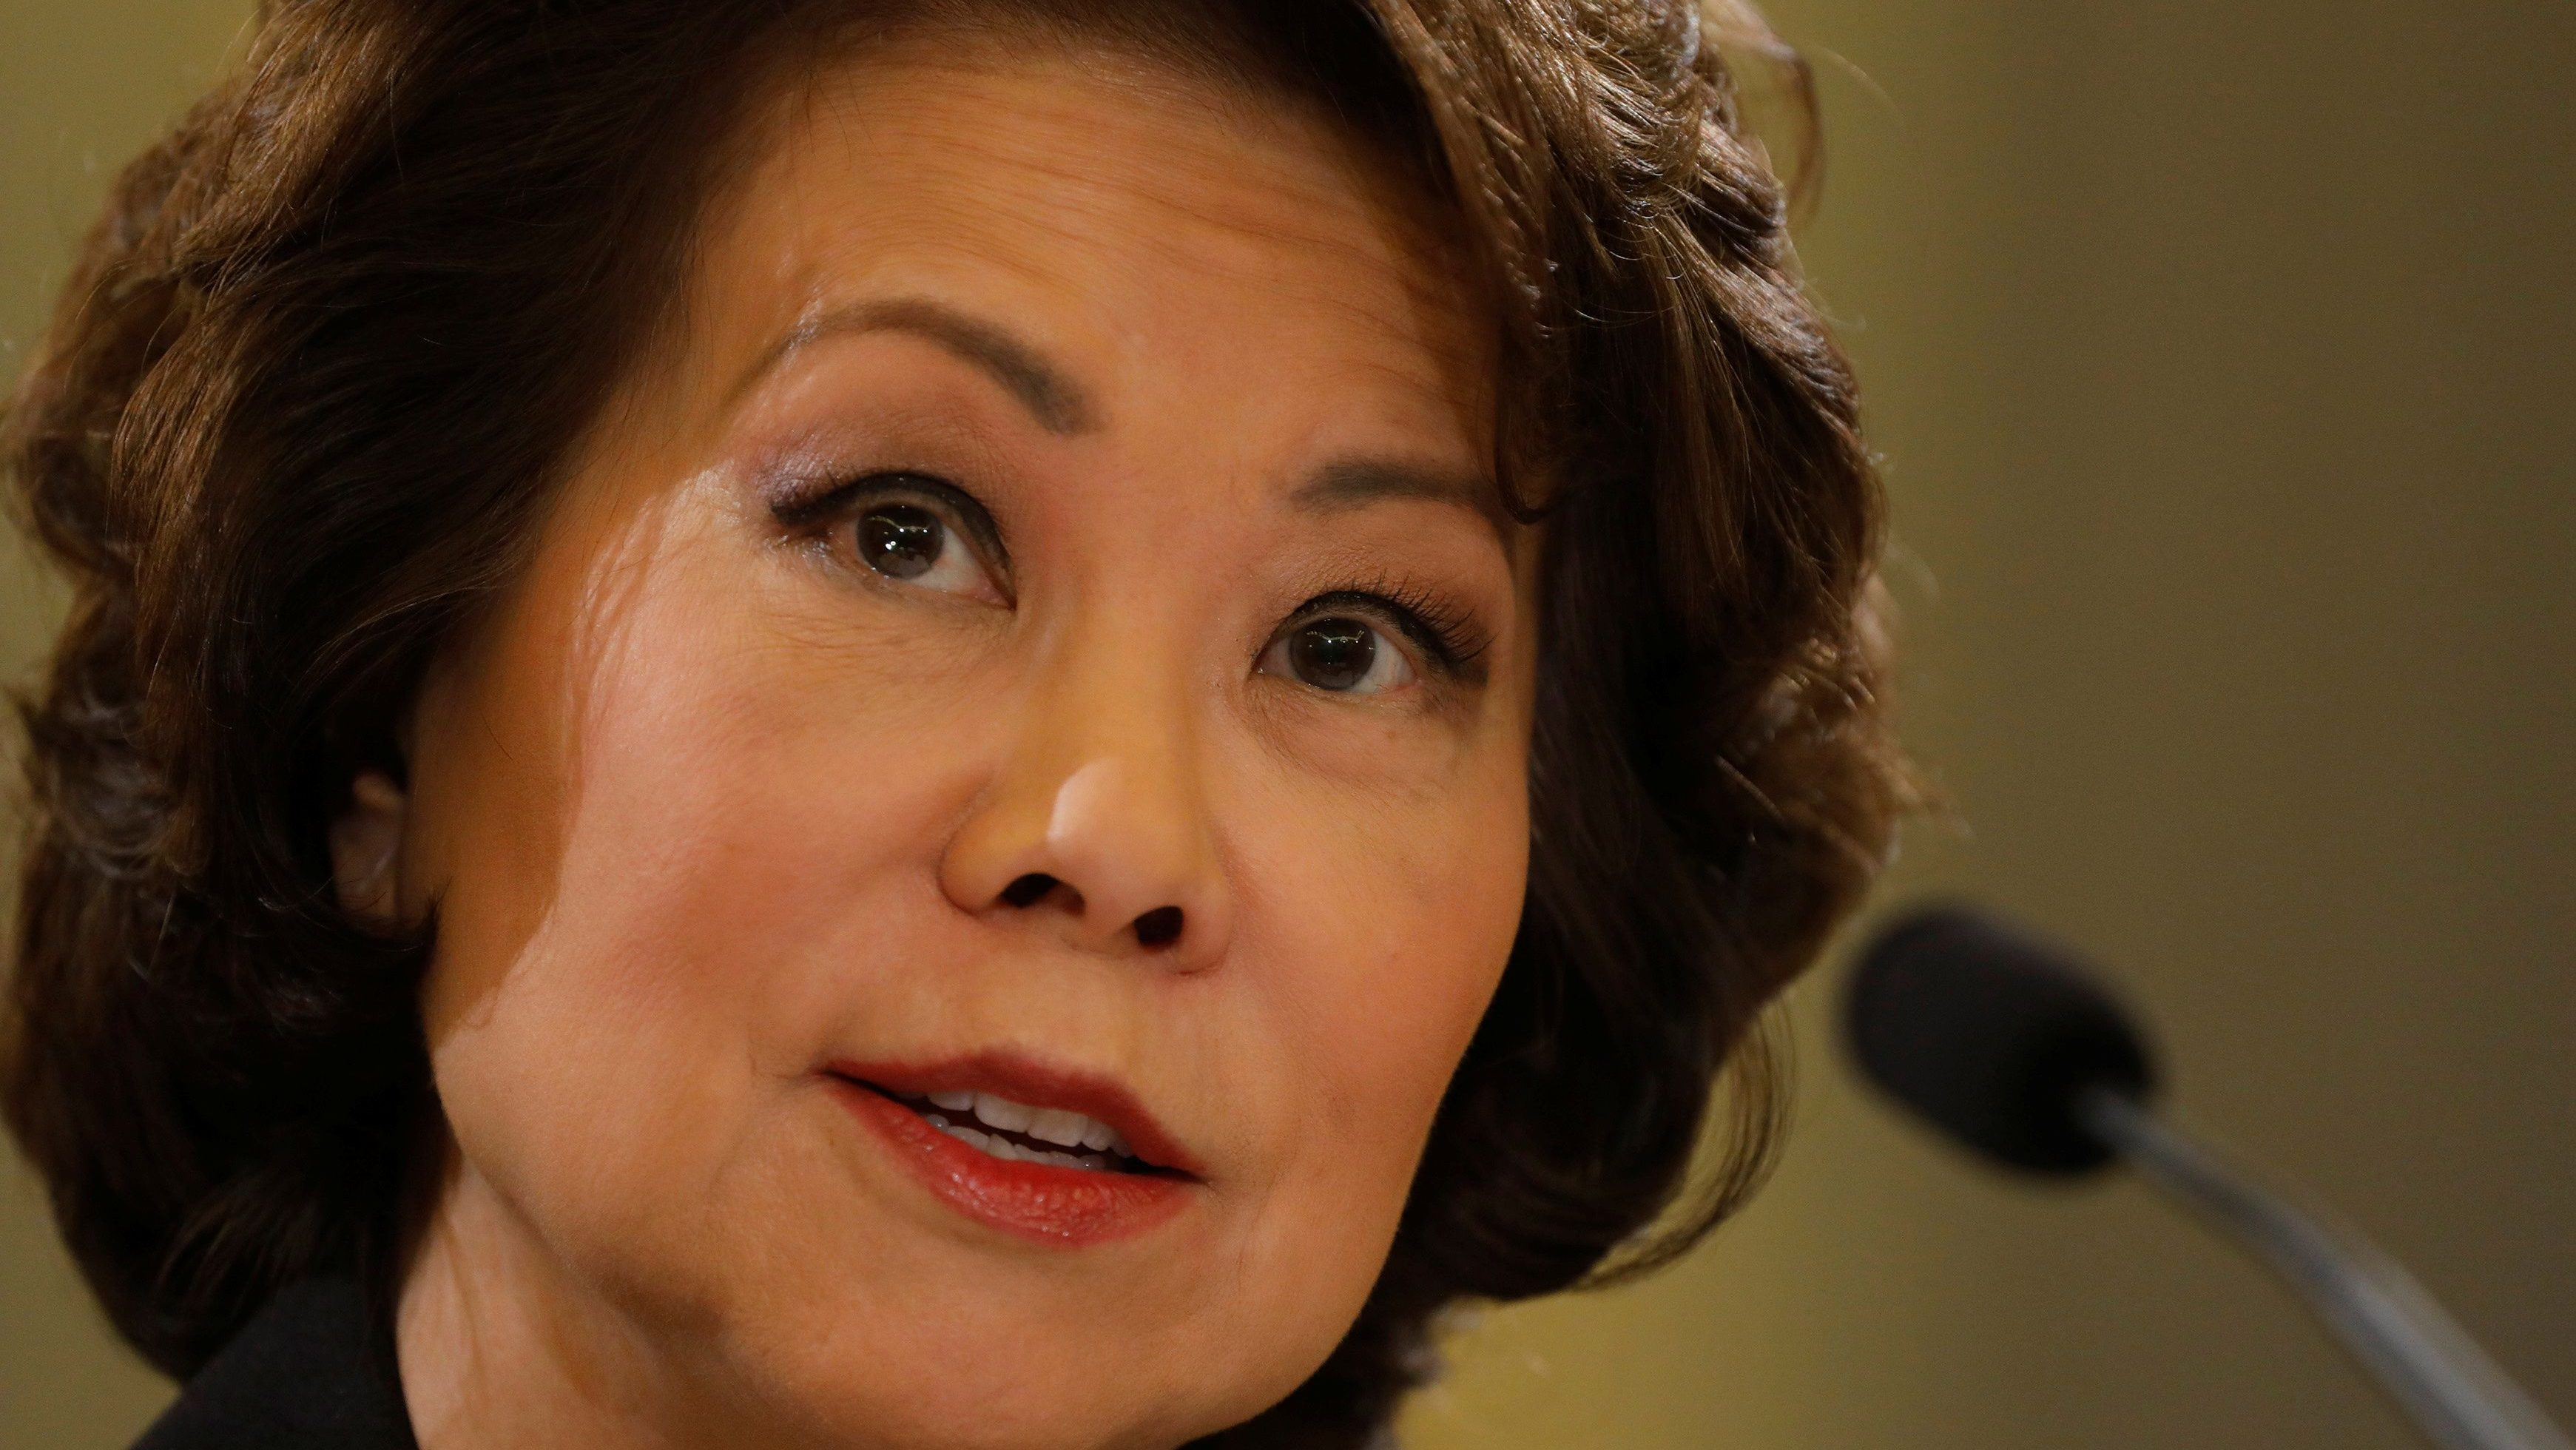 U.S. Secretary of Transportation Elaine Chao